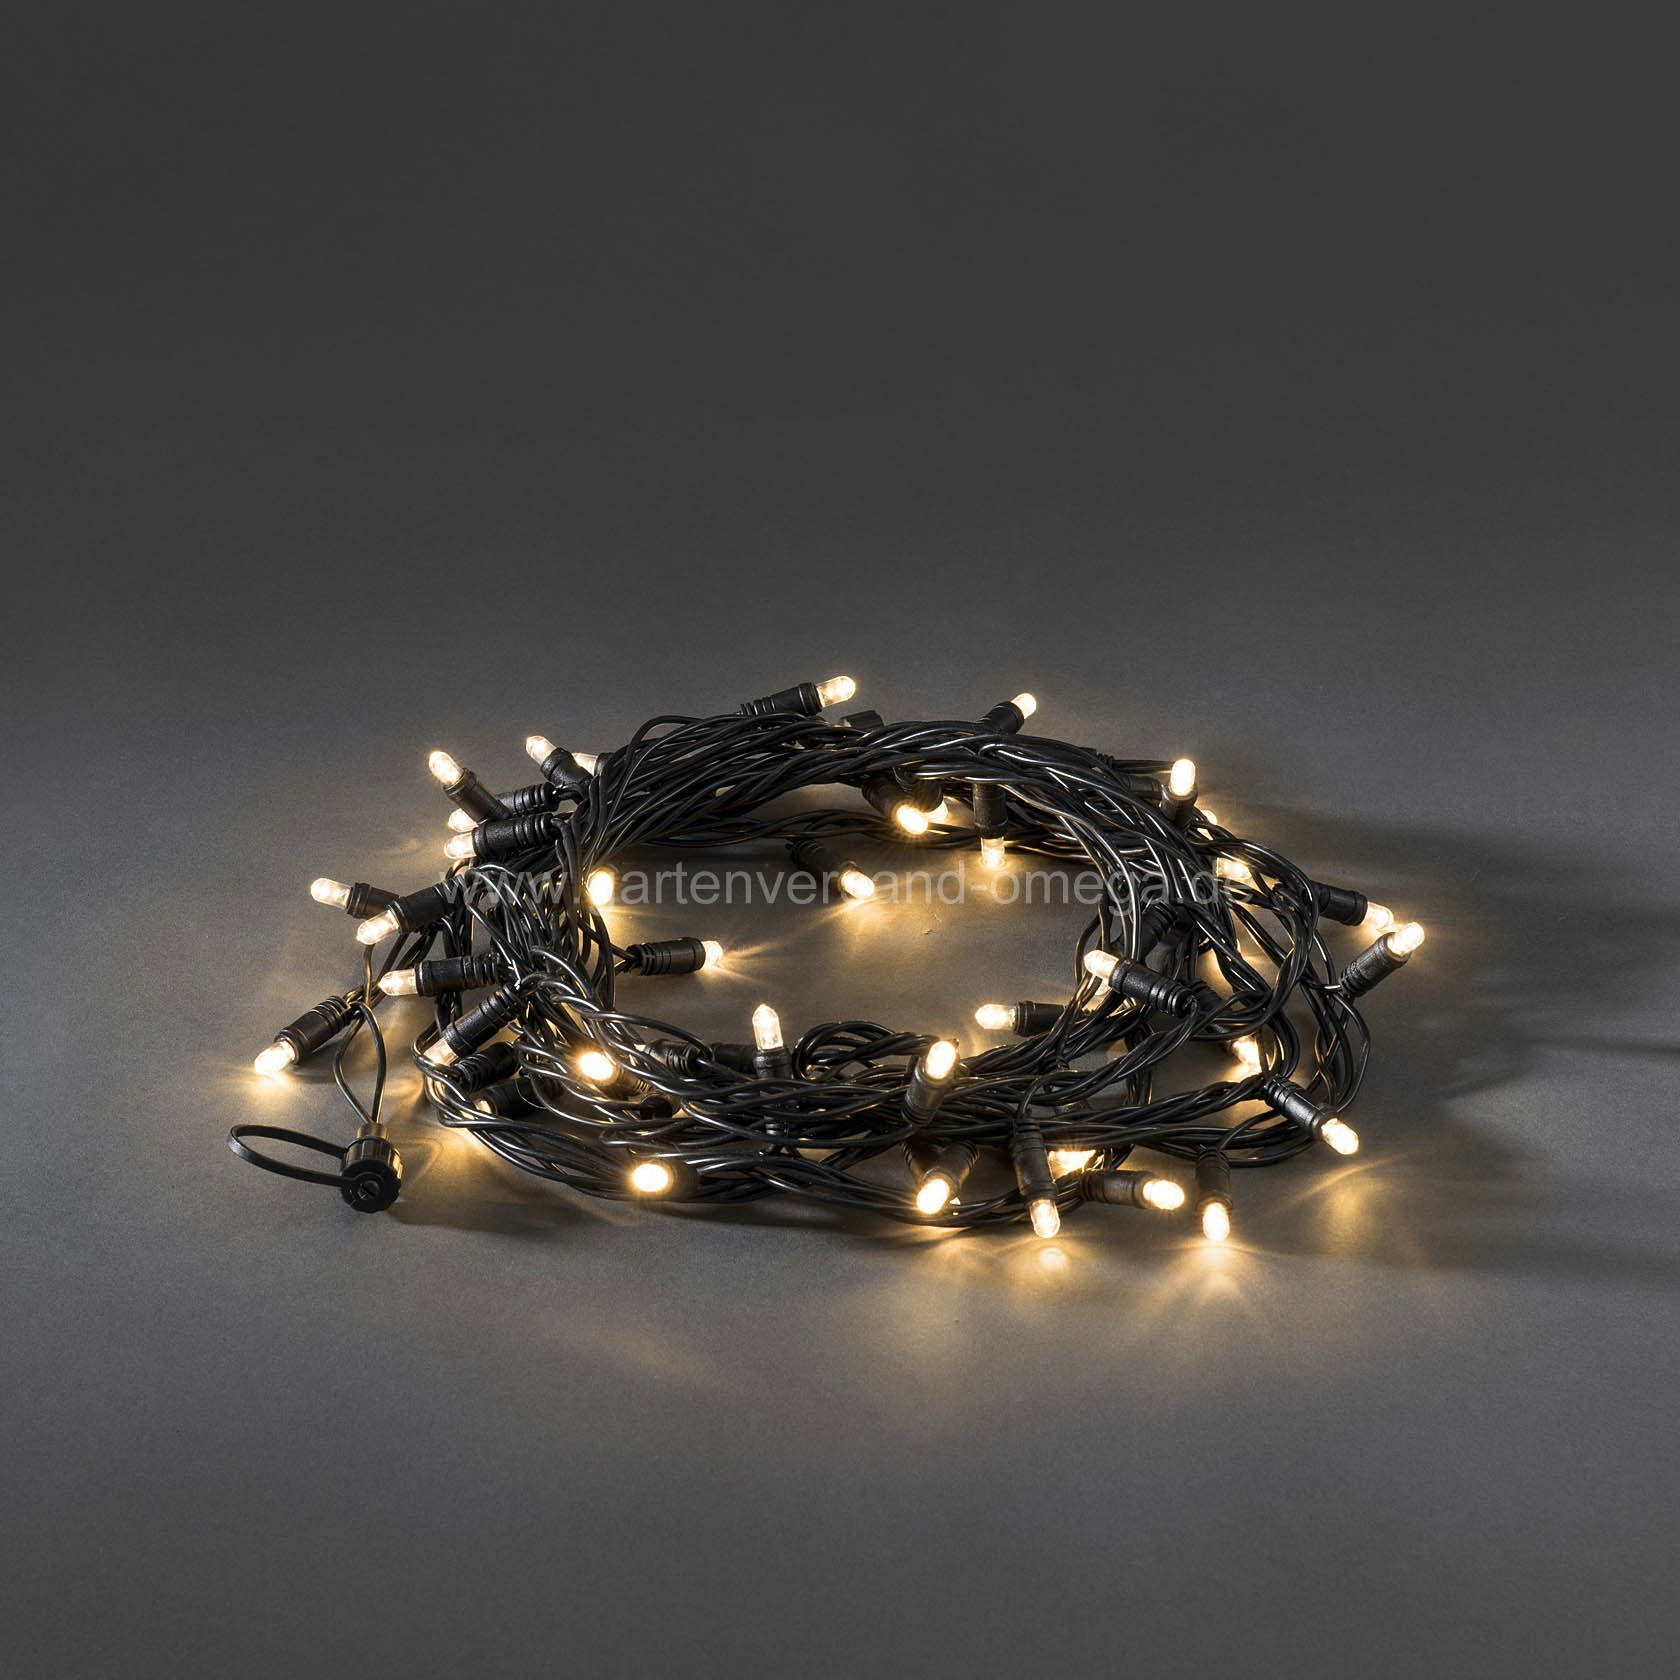 Verl ngerbare lichterkette basis set professionelle for Professionelle weihnachtsbeleuchtung